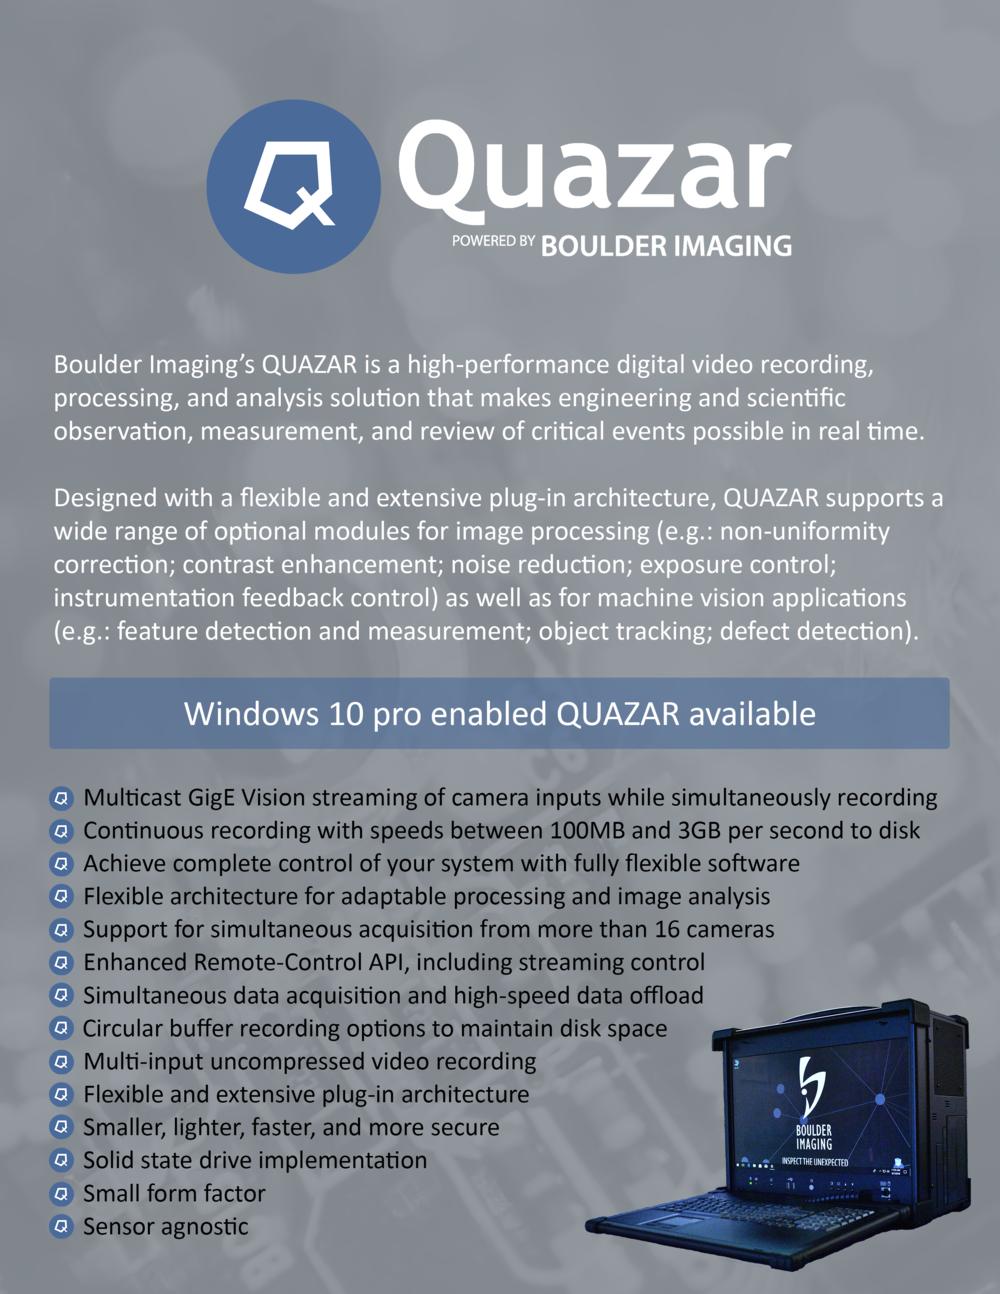 QUAZAR Technical Specifications